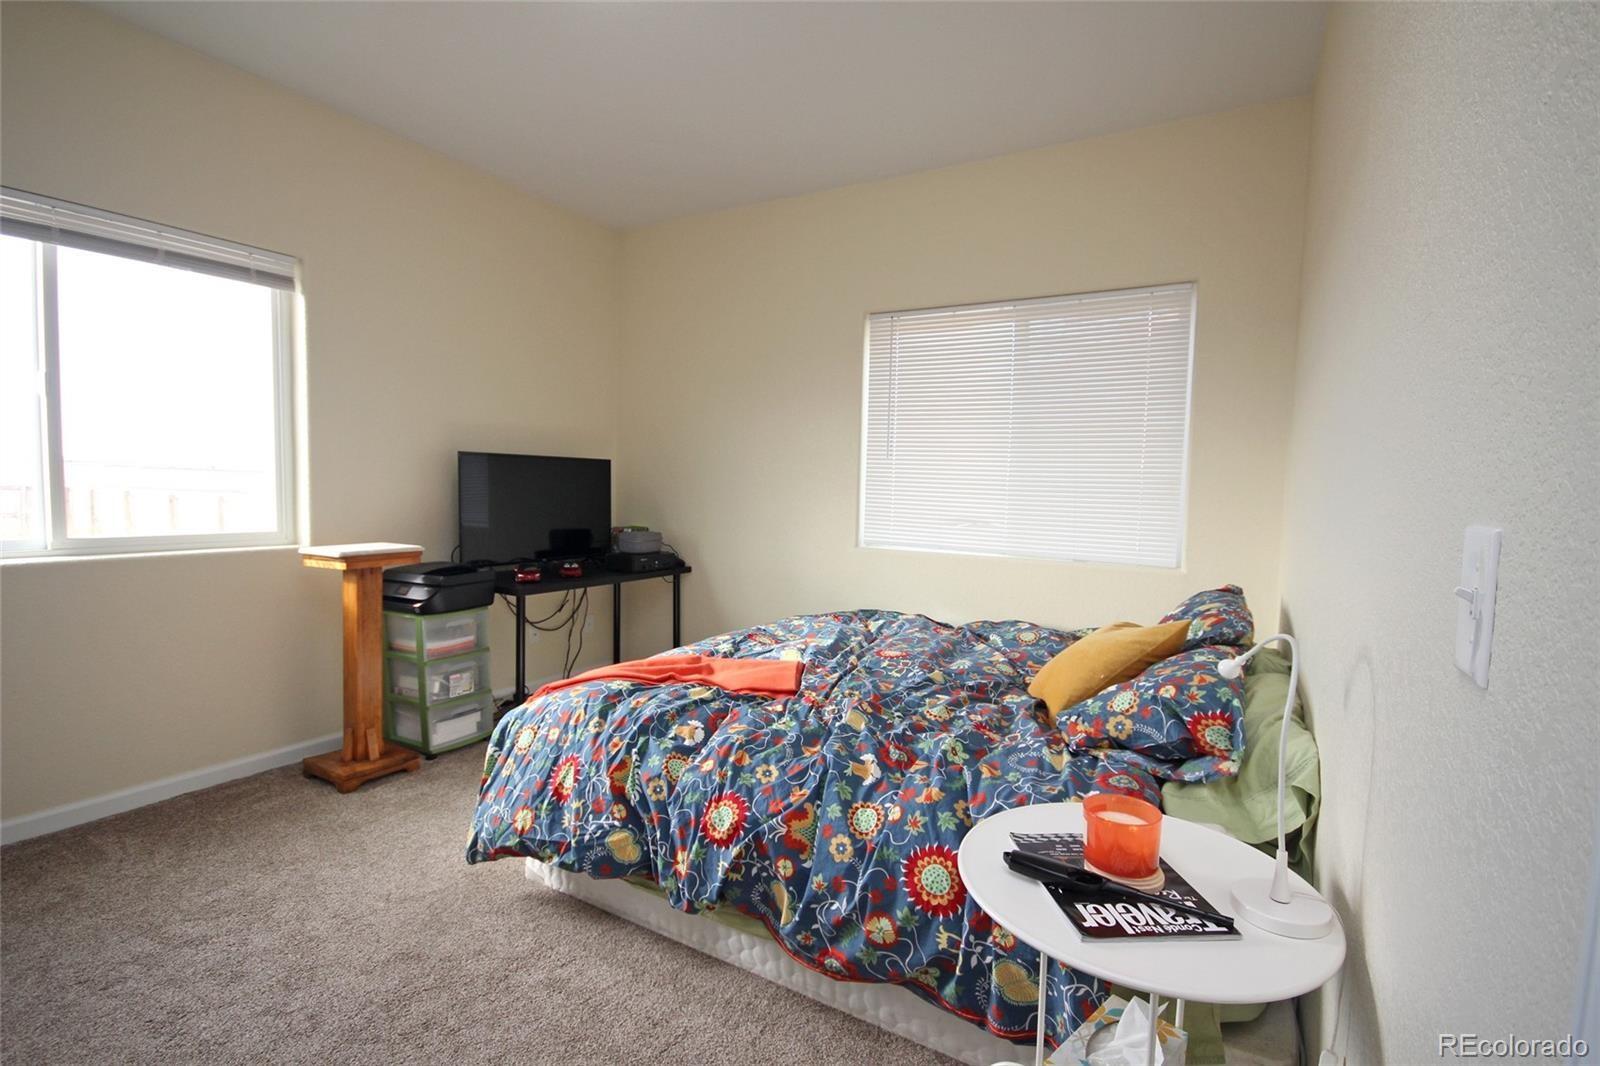 MLS# 6989445 - 14 - 1040 Viewridge Road, Bennett, CO 80102